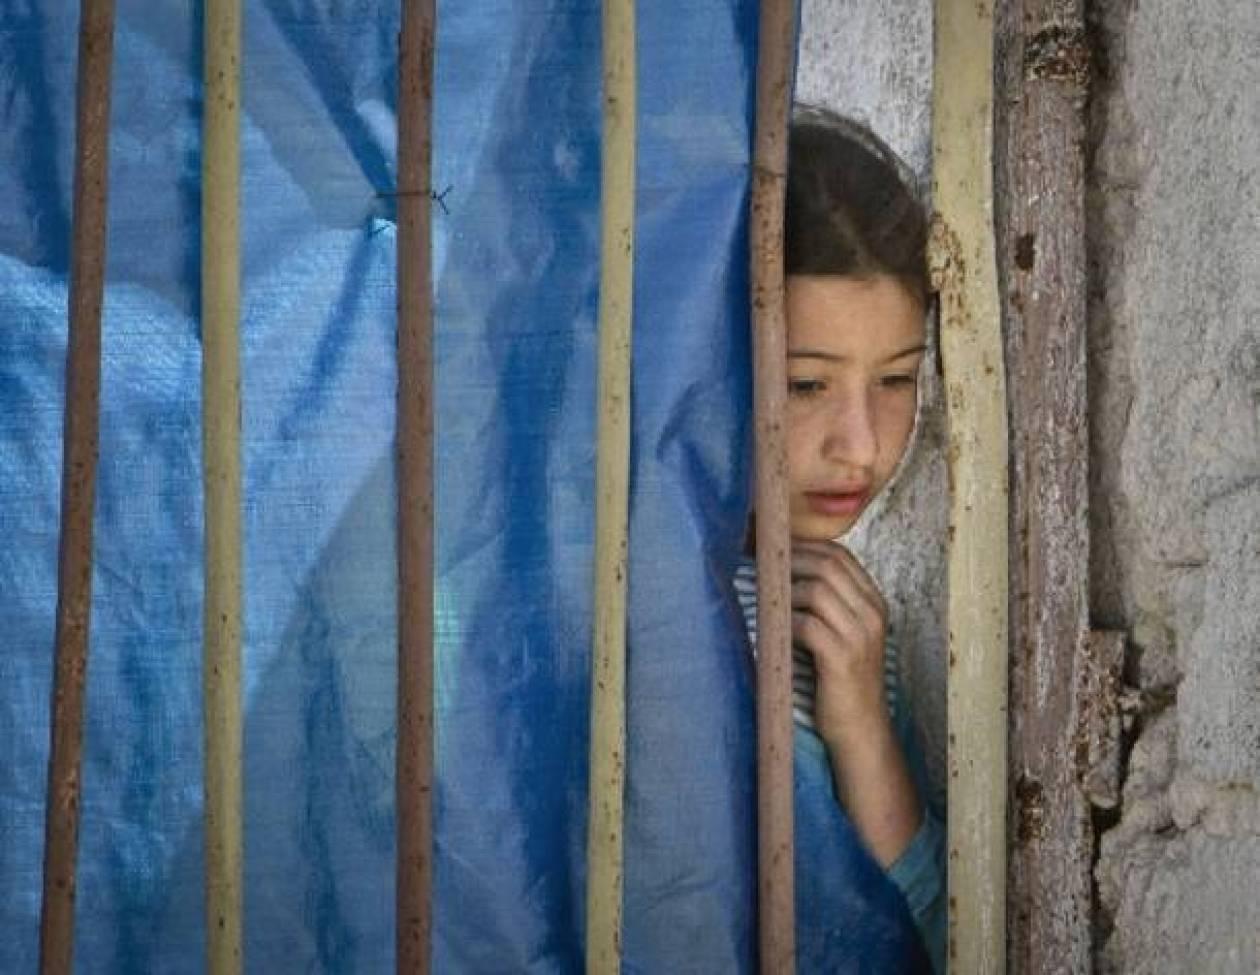 Spiegel για πρόσφυγες: Μένουν στους δρόμους ή σε άθλια καταλύματα...